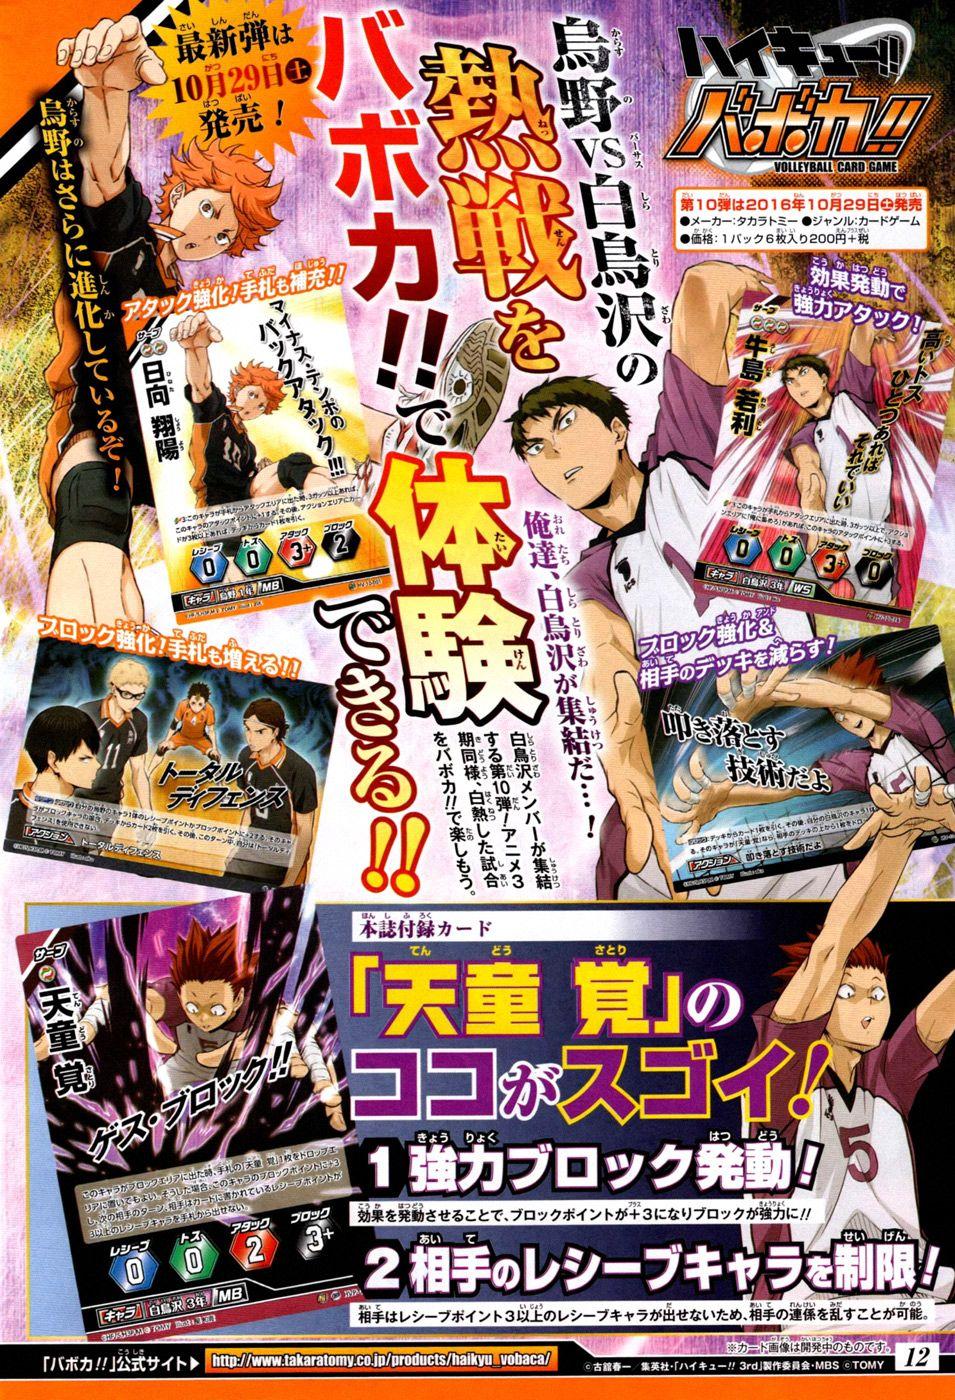 http://c5.ninemanga.com/es_manga/pic2/10/10/503940/45ad7d49b501d247ad778096728ff67a.jpg Page 2